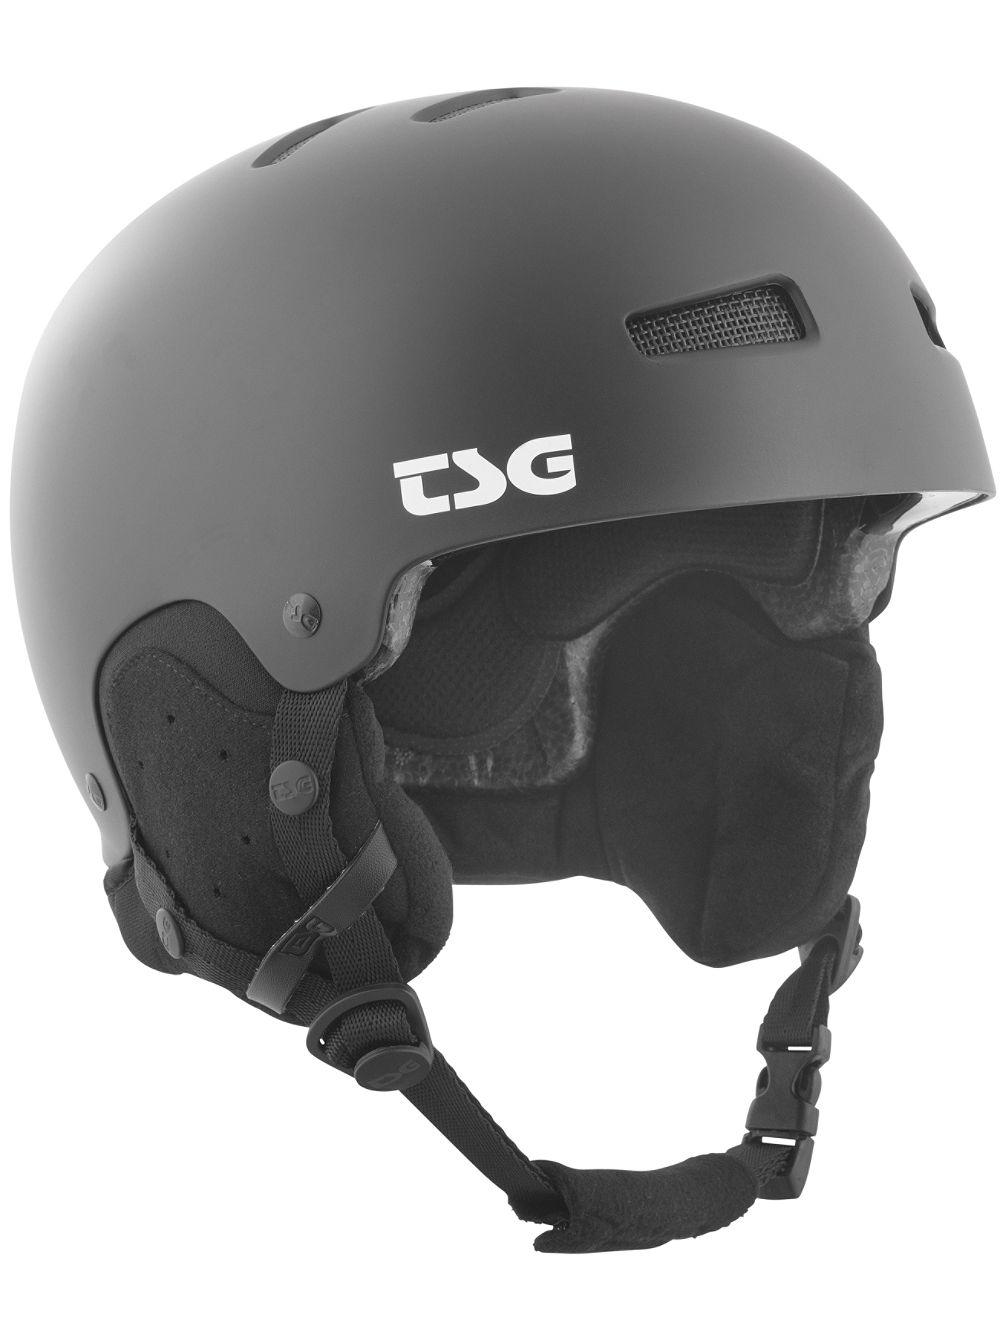 tsg-gravity-solid-color-helmet